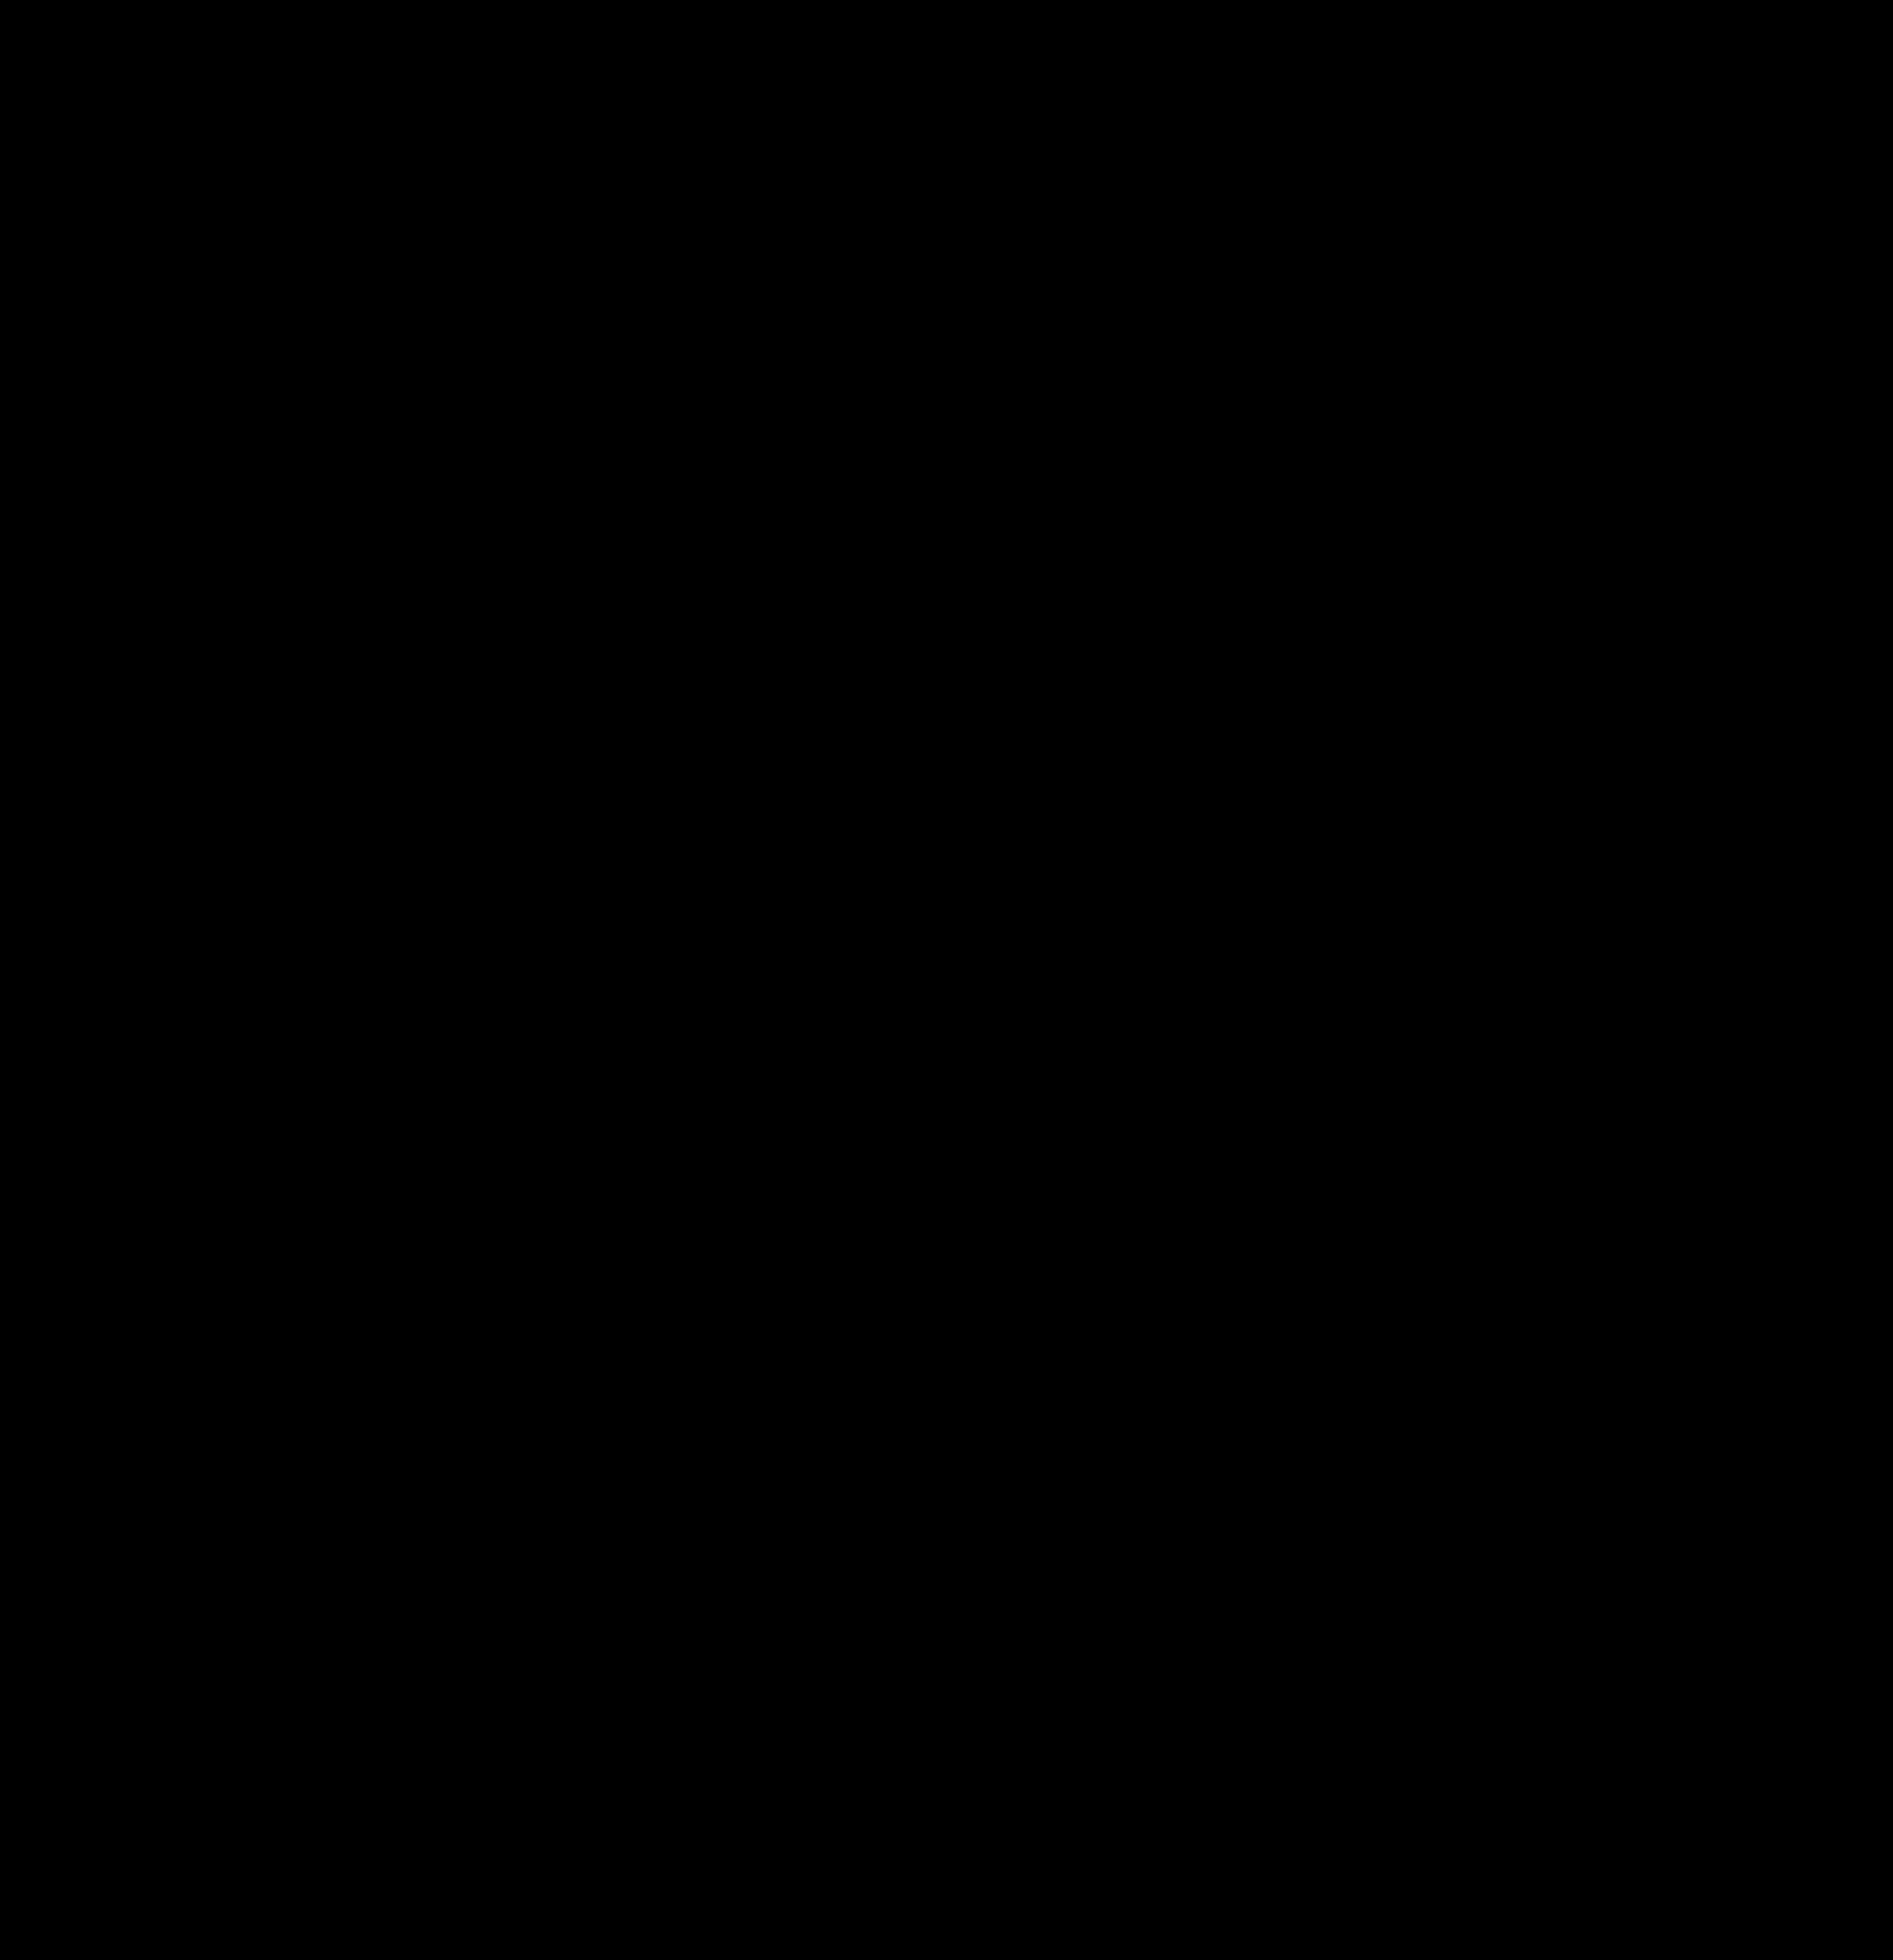 Dragon Head Vector Clipart.